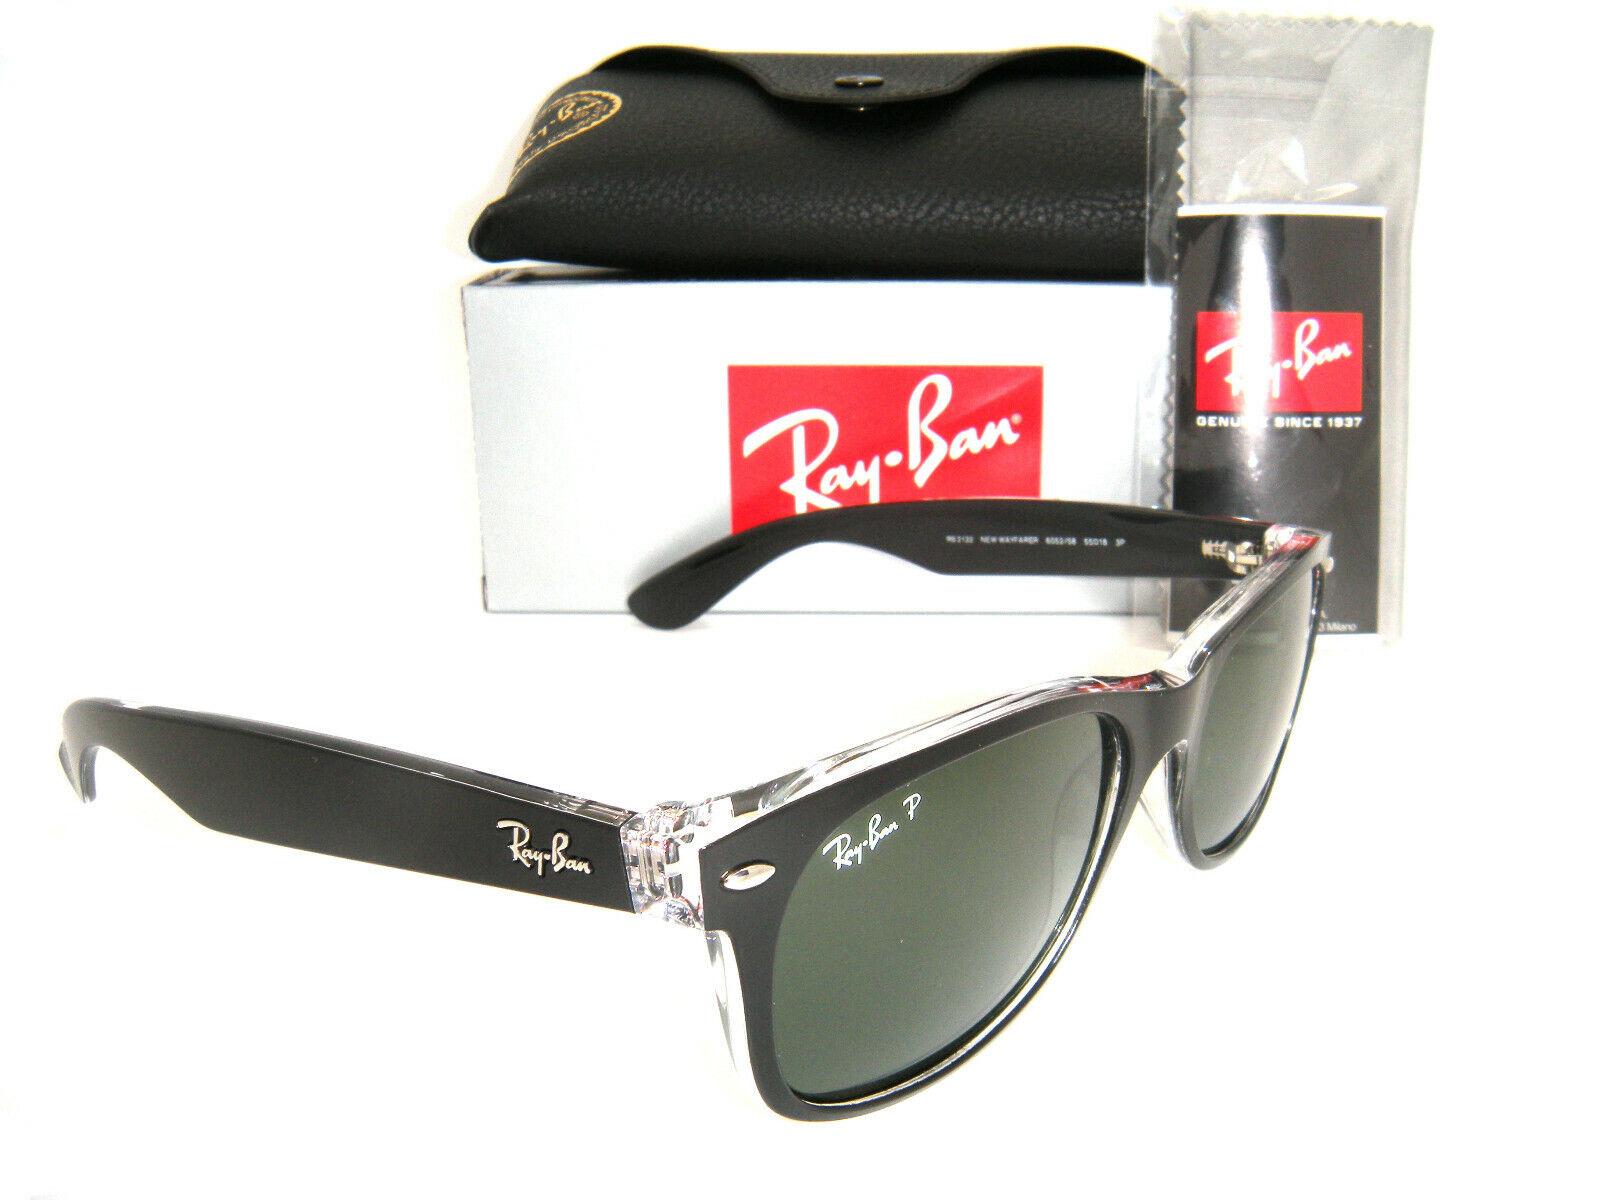 Ray-Ban RB2132 605258 52MM Sunglasses